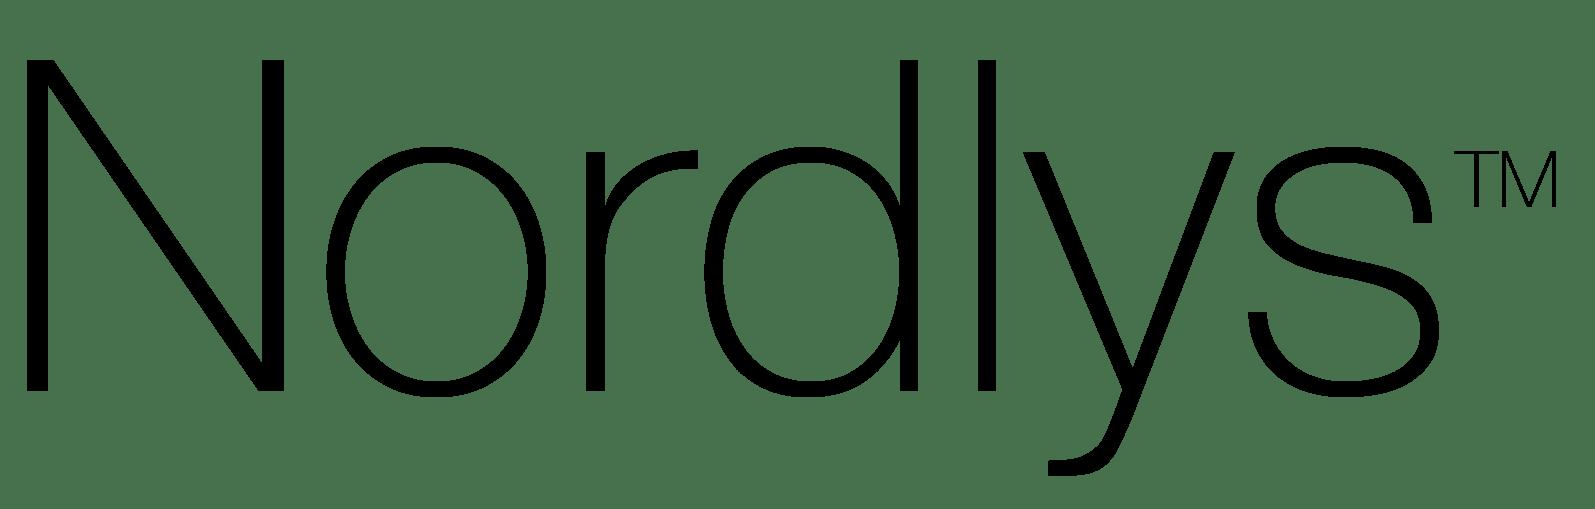 NordlysTM_black